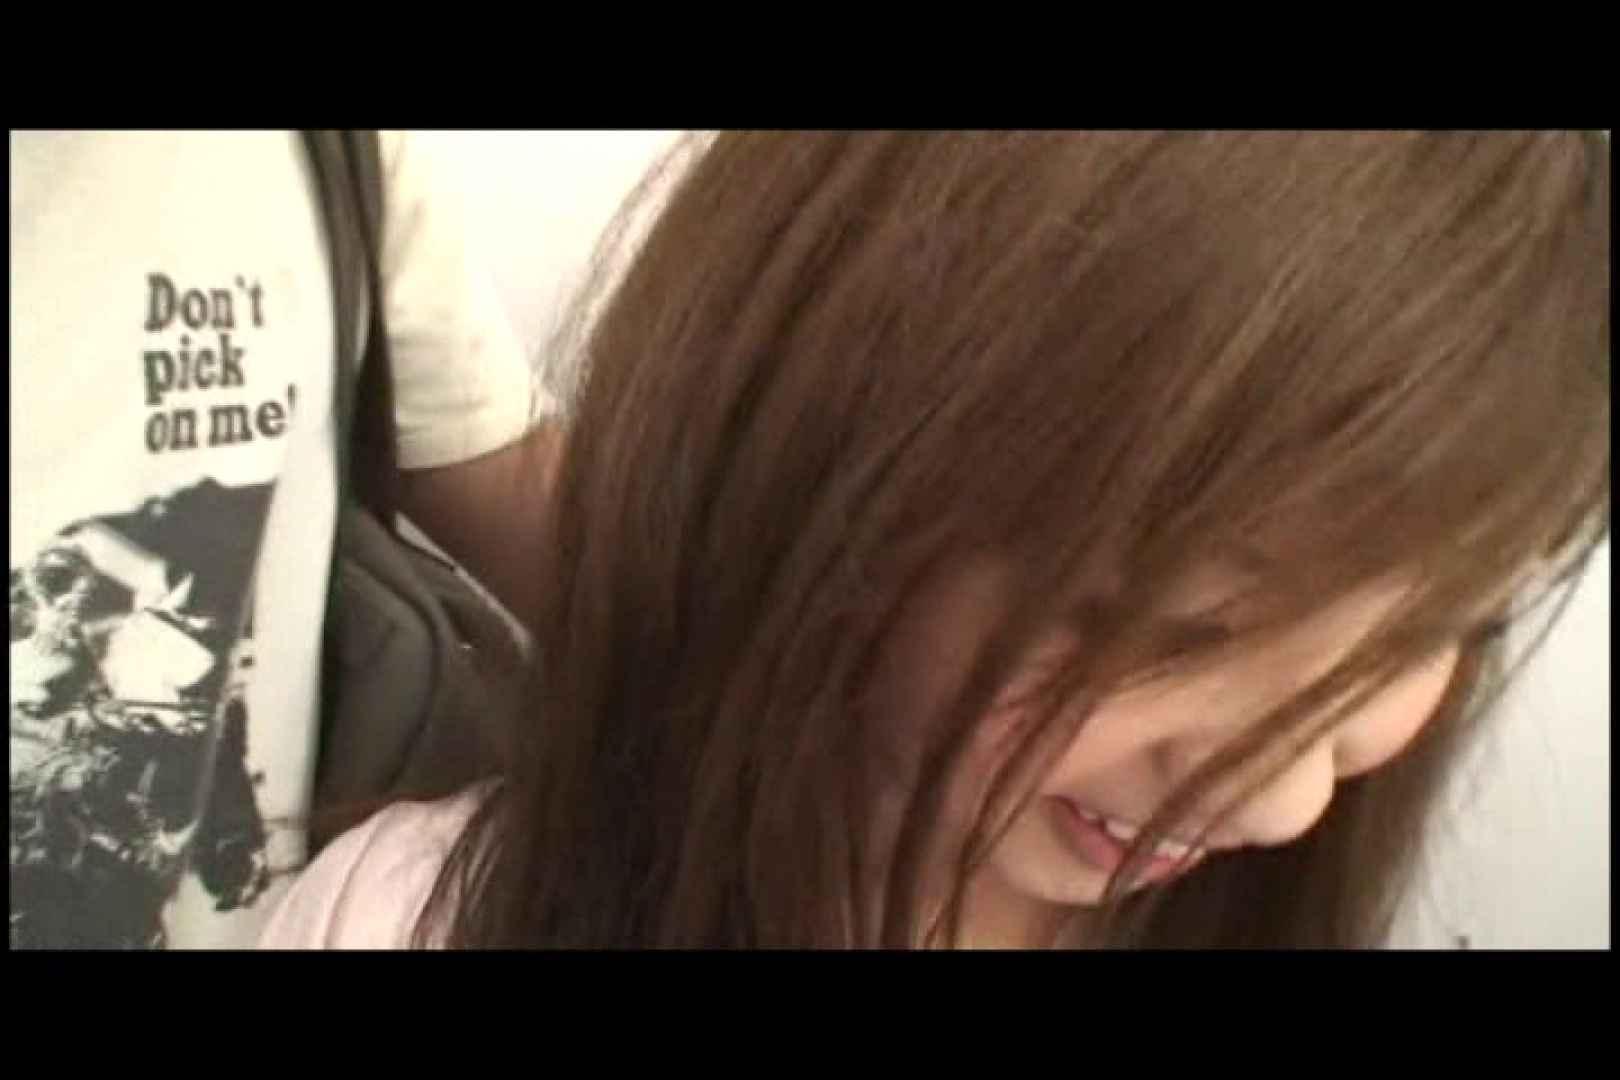 JDハンター全国ツアー vol.052 前編 女子大生のエロ動画 | 0  110PIX 47